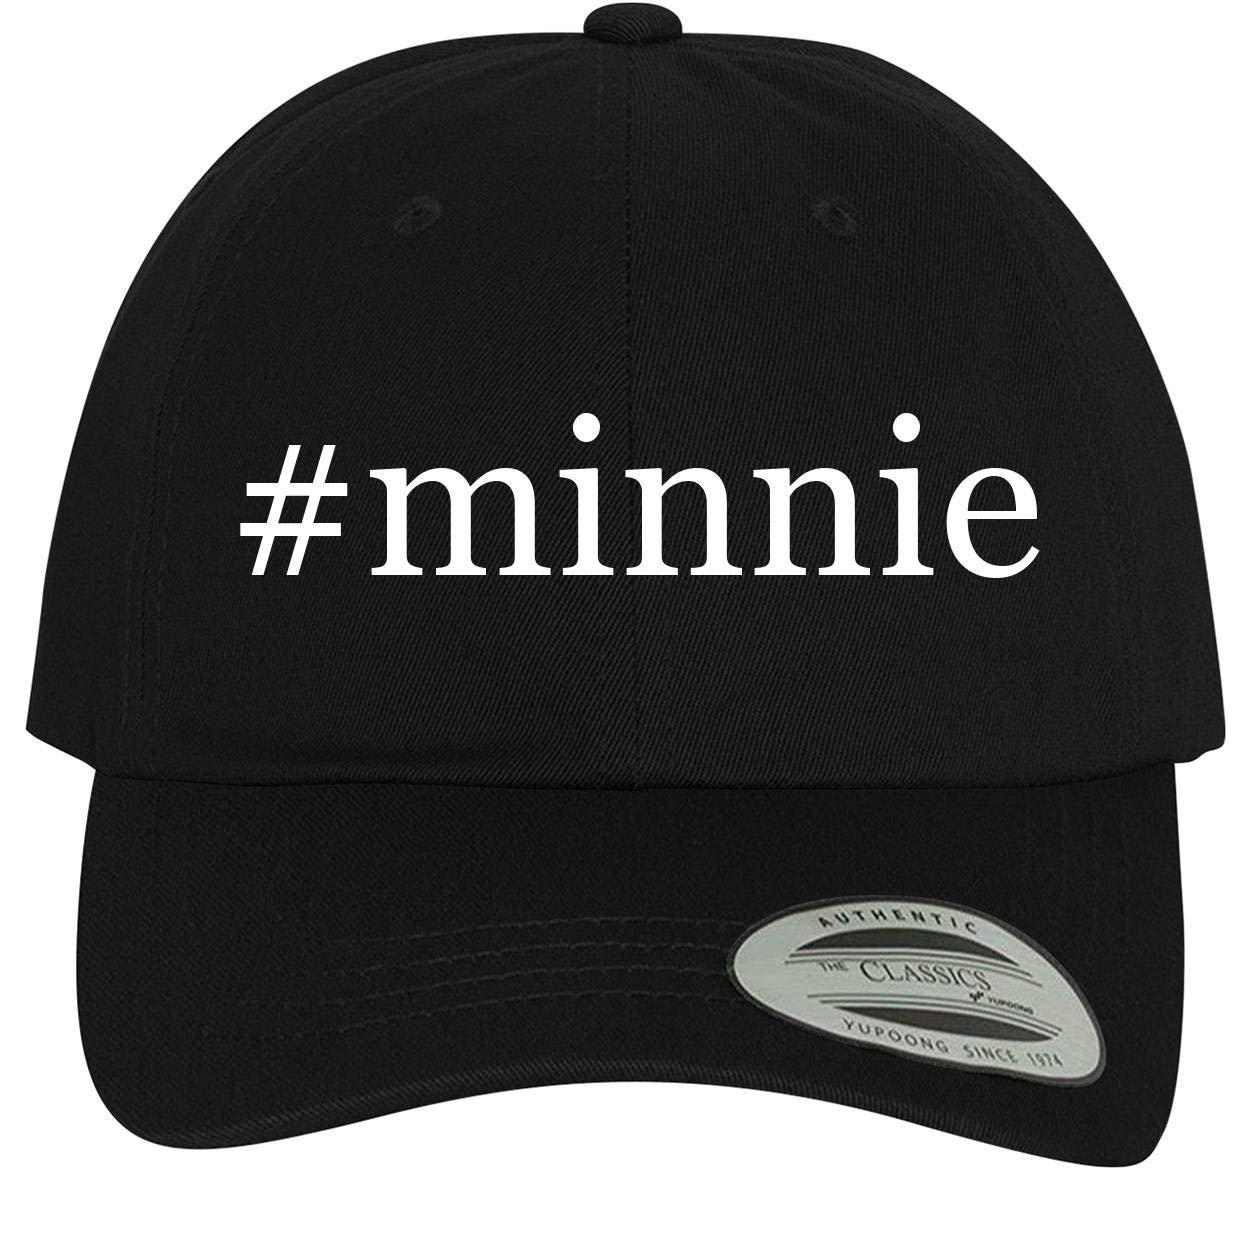 Comfortable Dad Hat Baseball Cap #Minnie